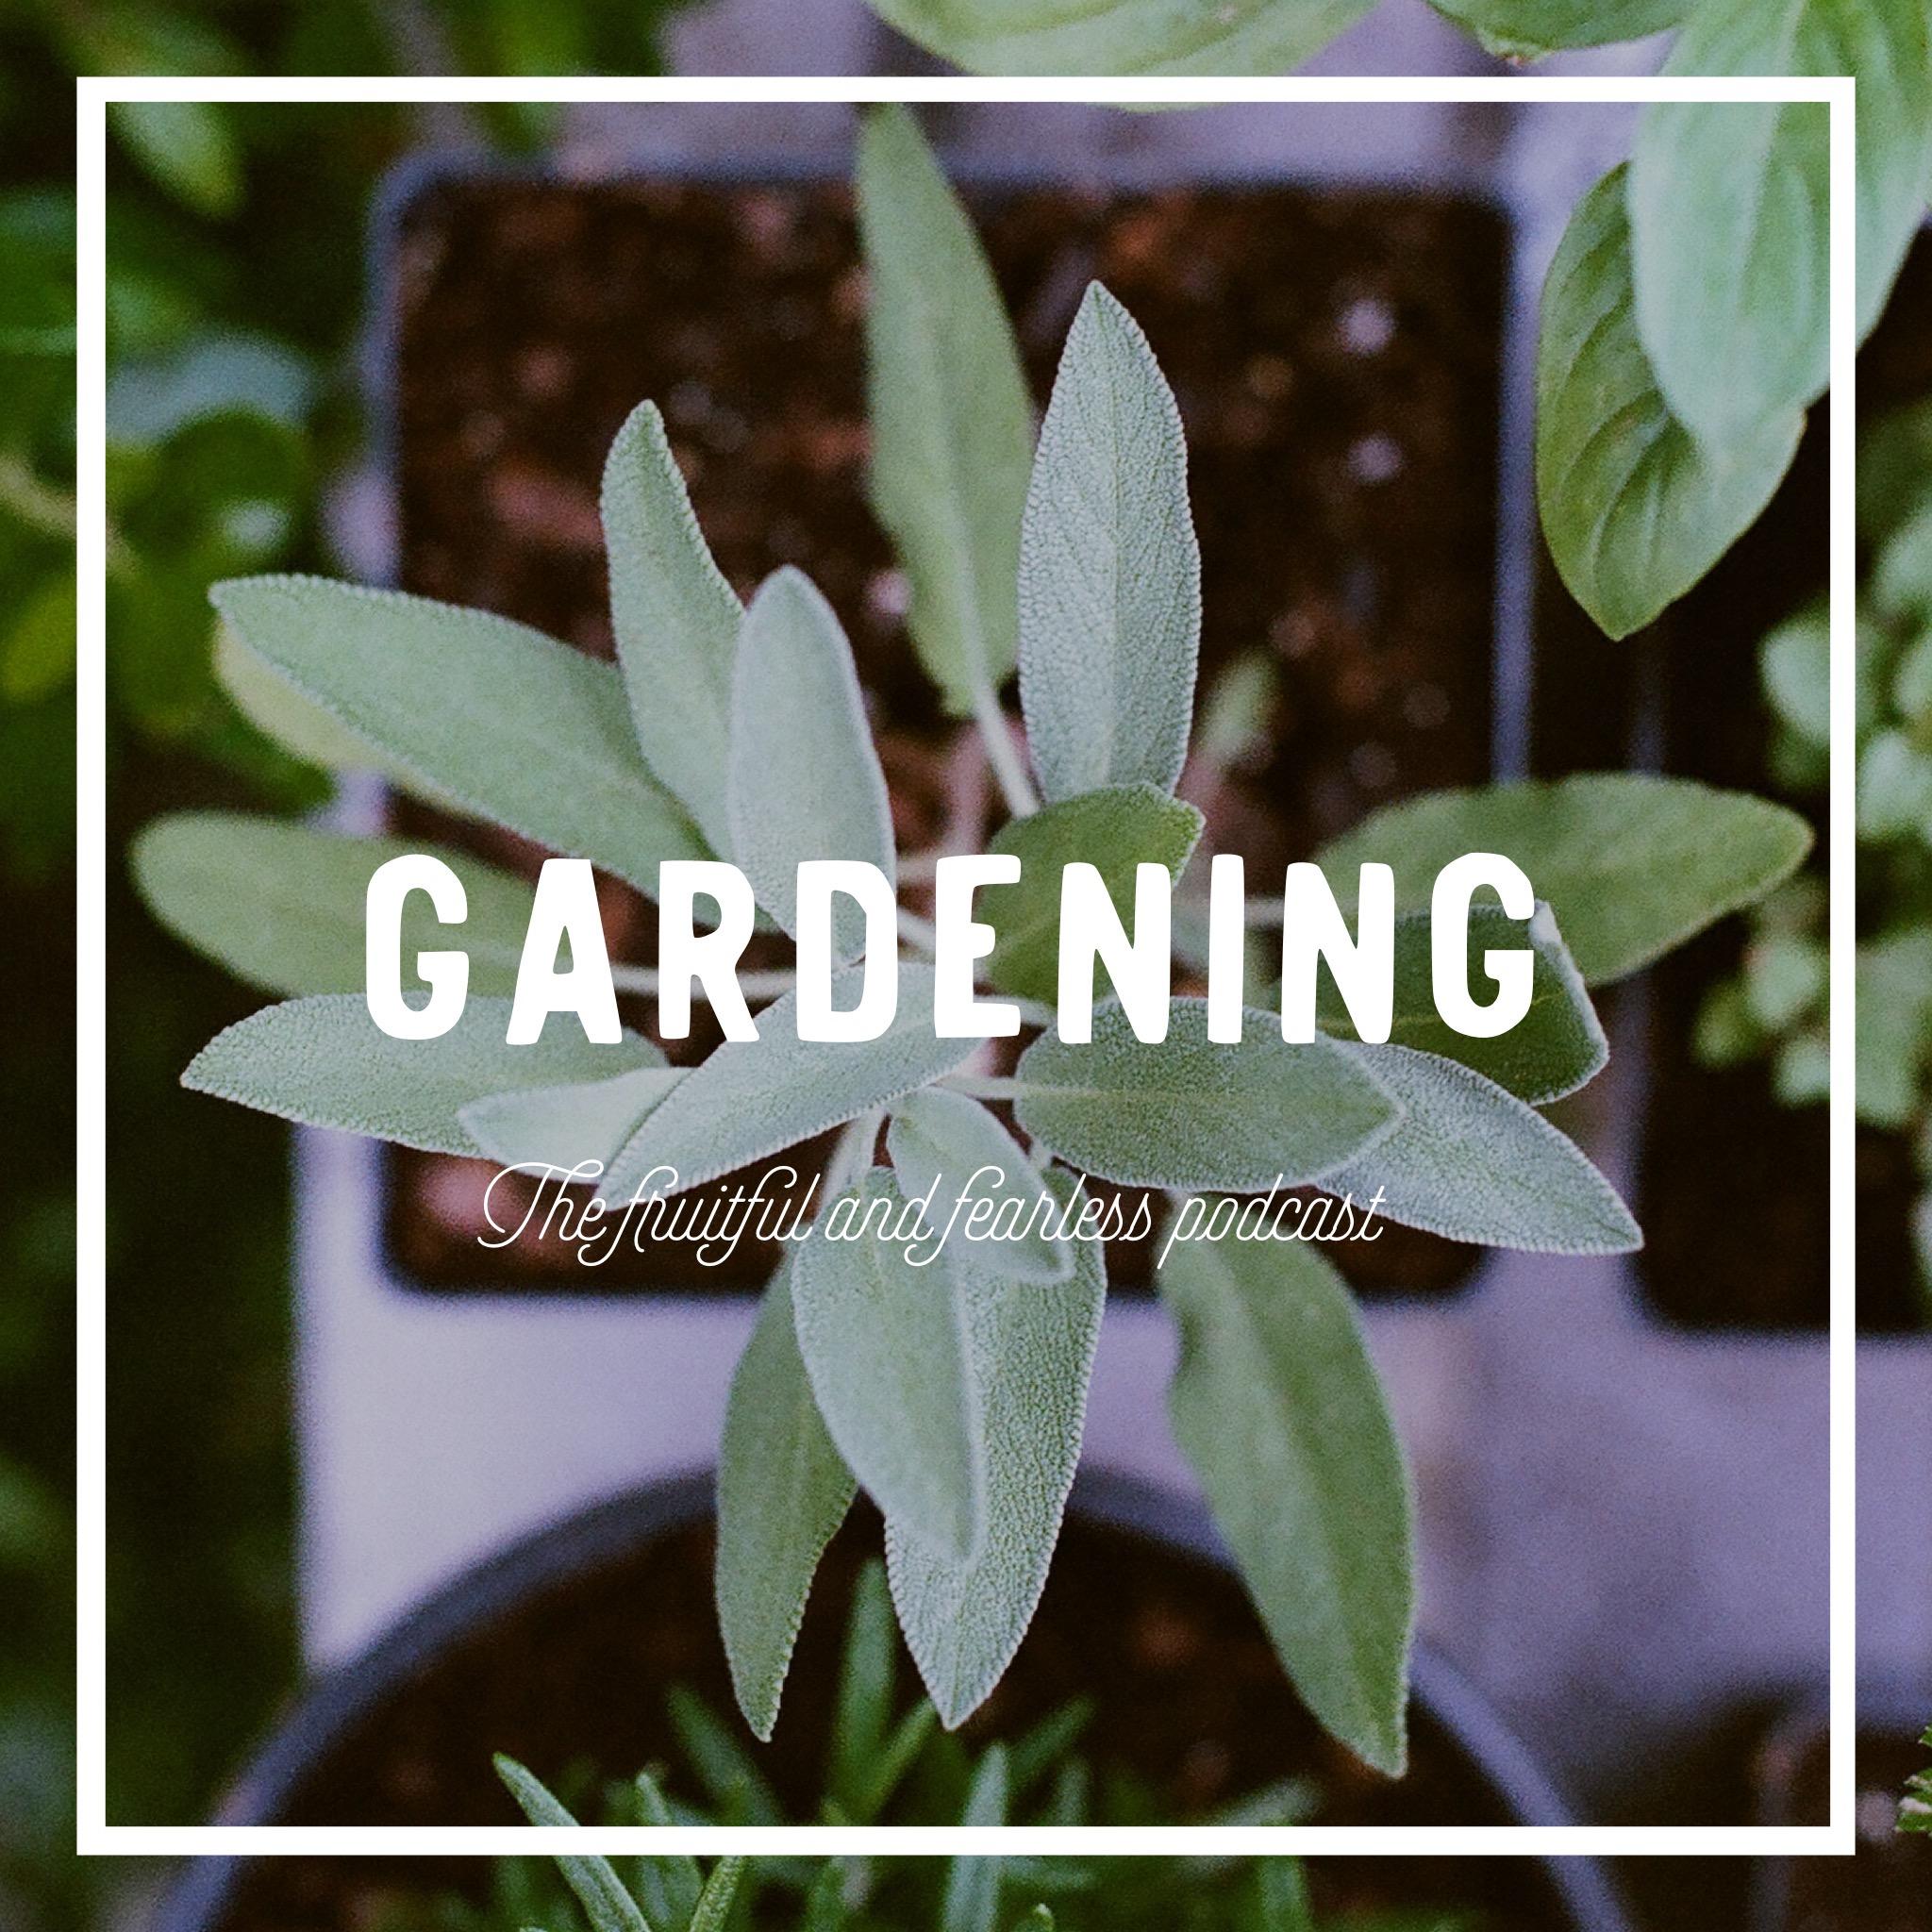 #36 Gardening